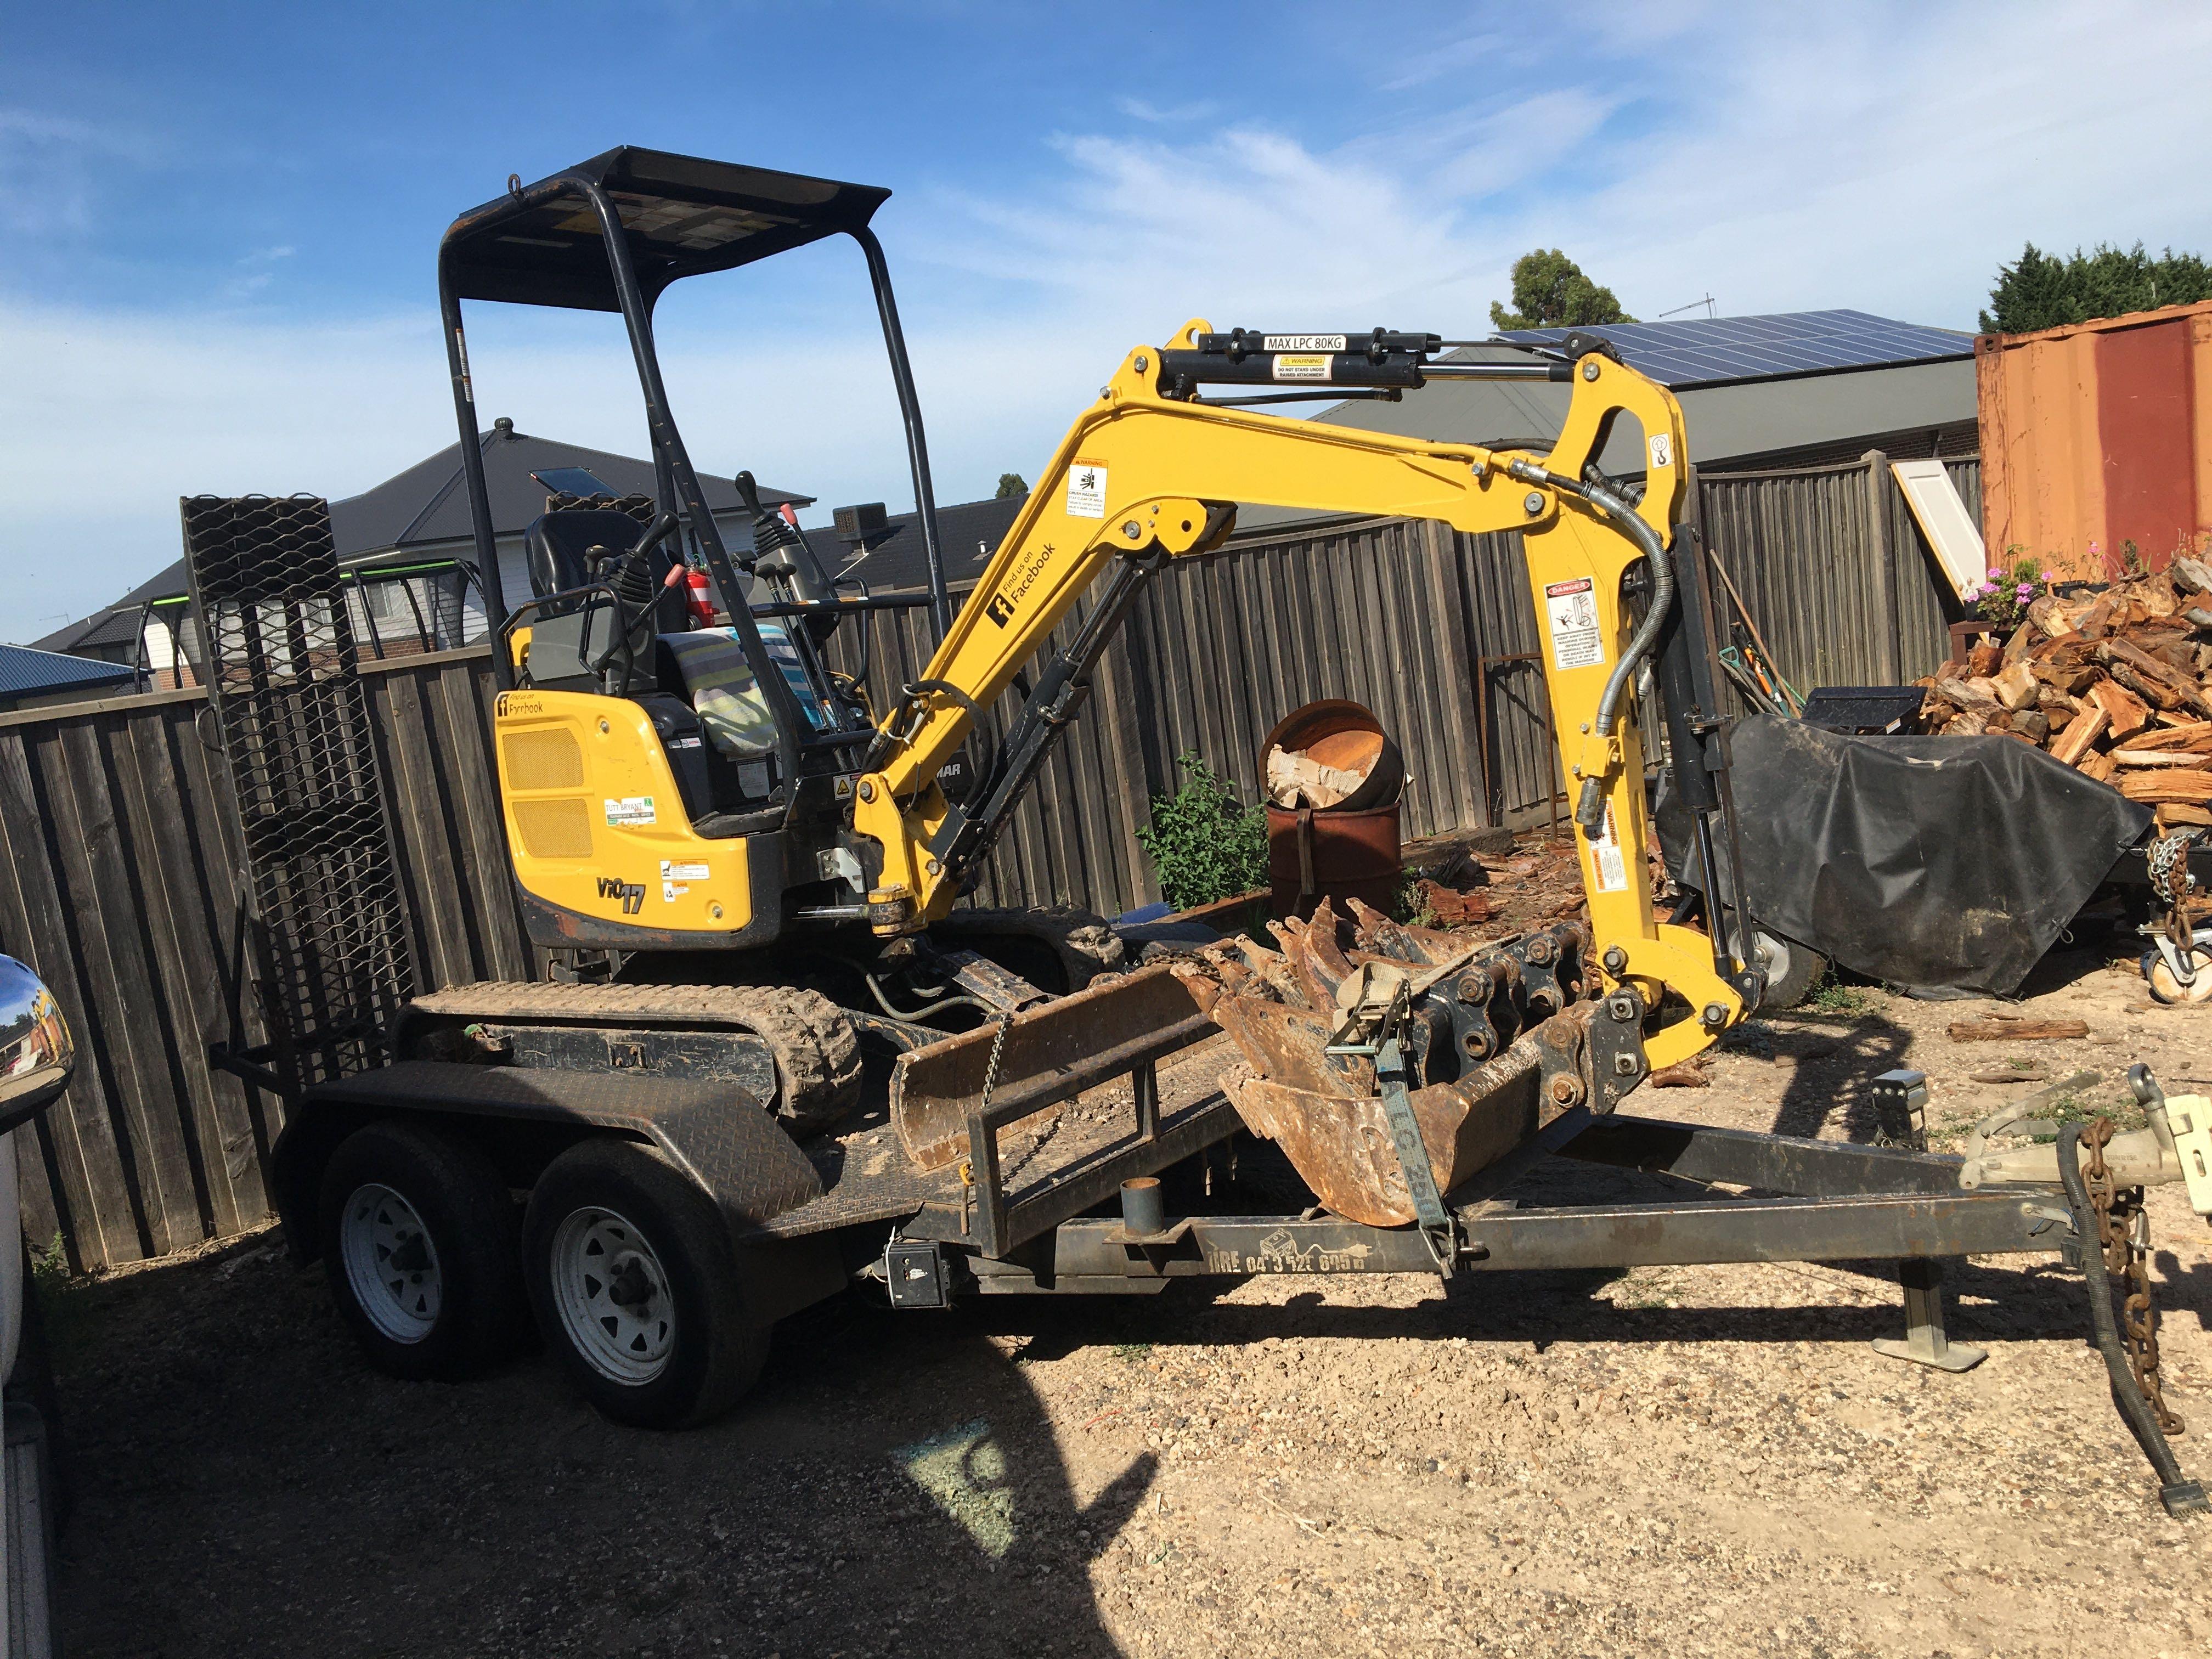 1.7 Tonne Excavator for wet hire